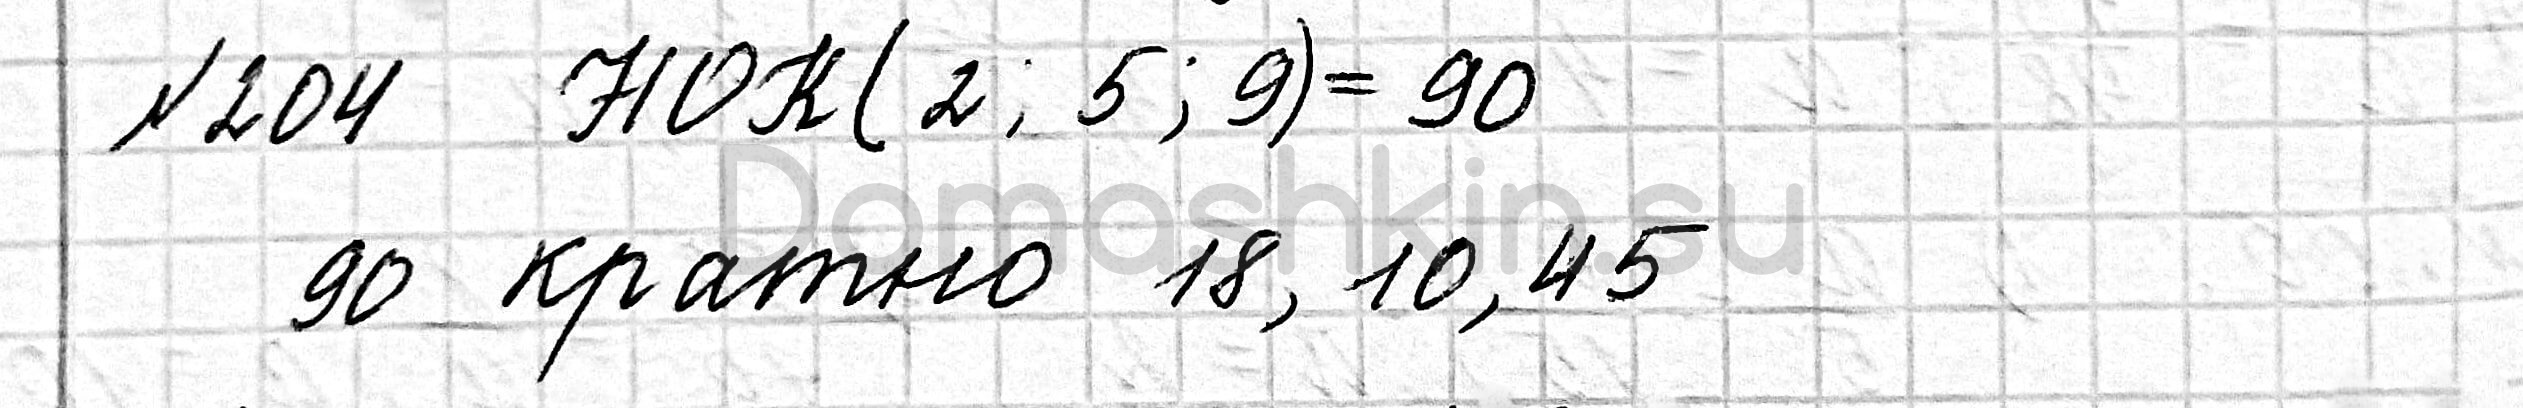 Математика 6 класс учебник Мерзляк номер 204 решение